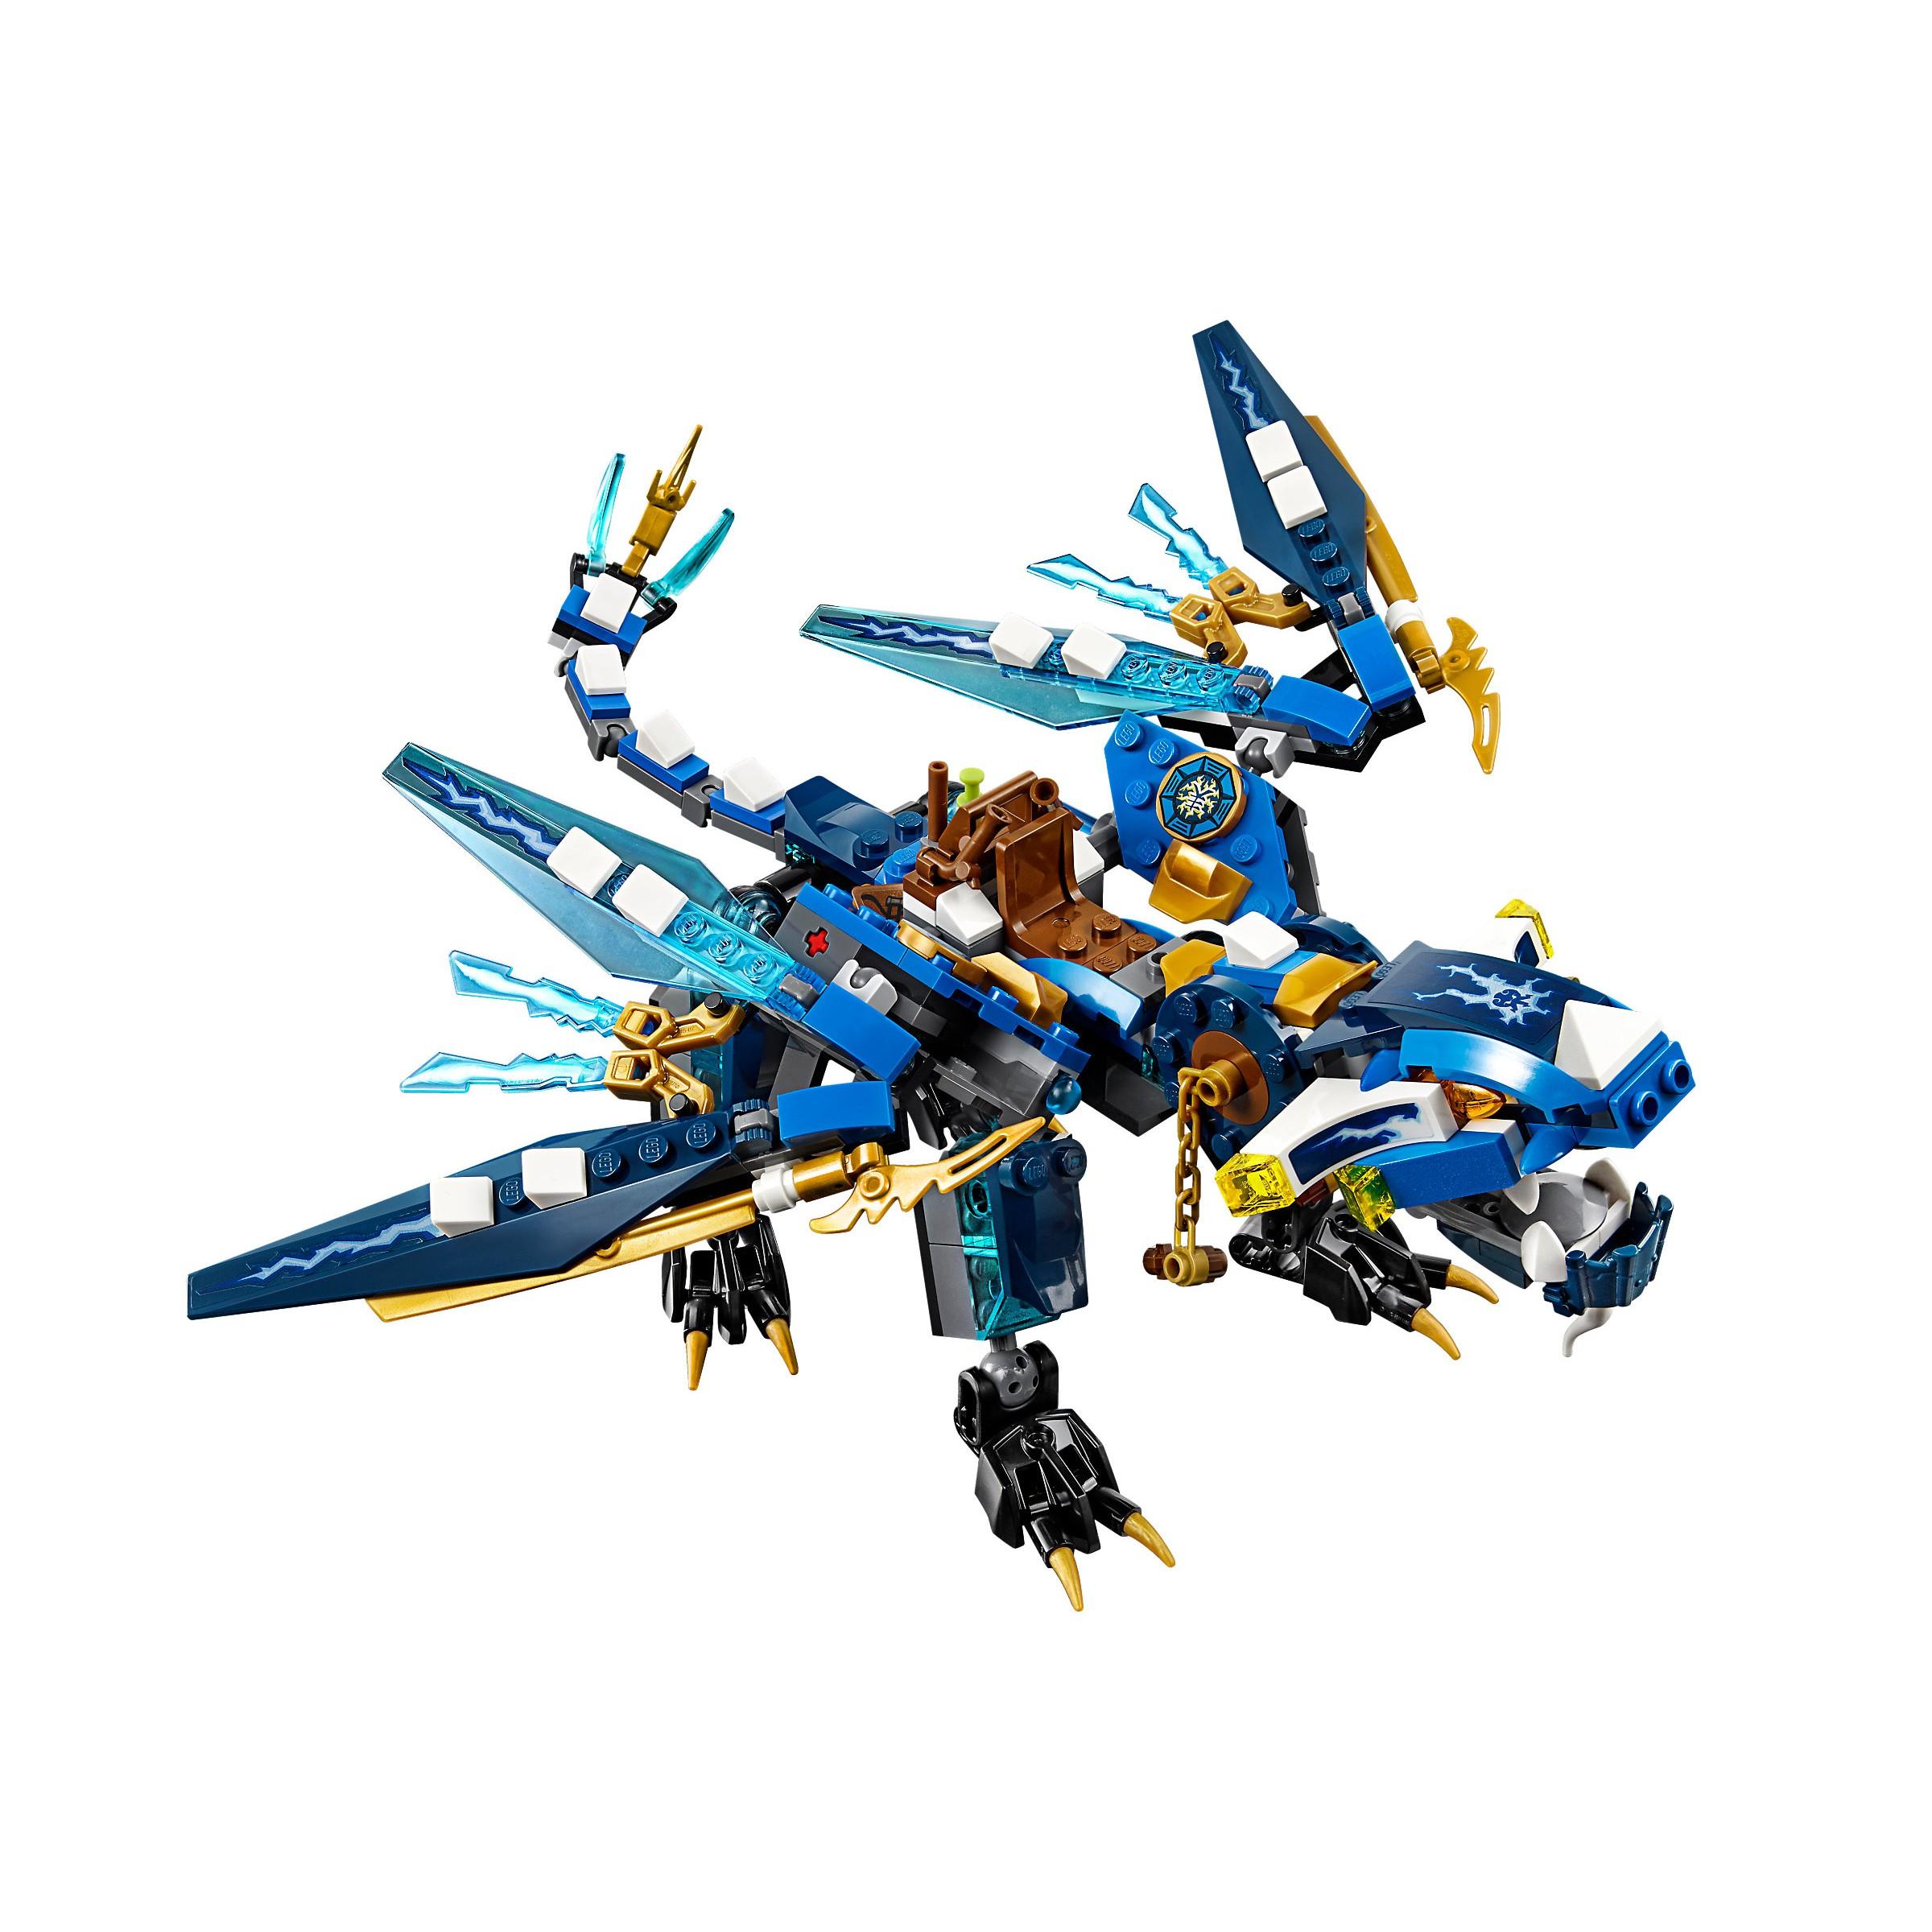 Lego 70602 ninjago jay 39 s elemental dragon at hobby warehouse - Dragon ninjago lego ...